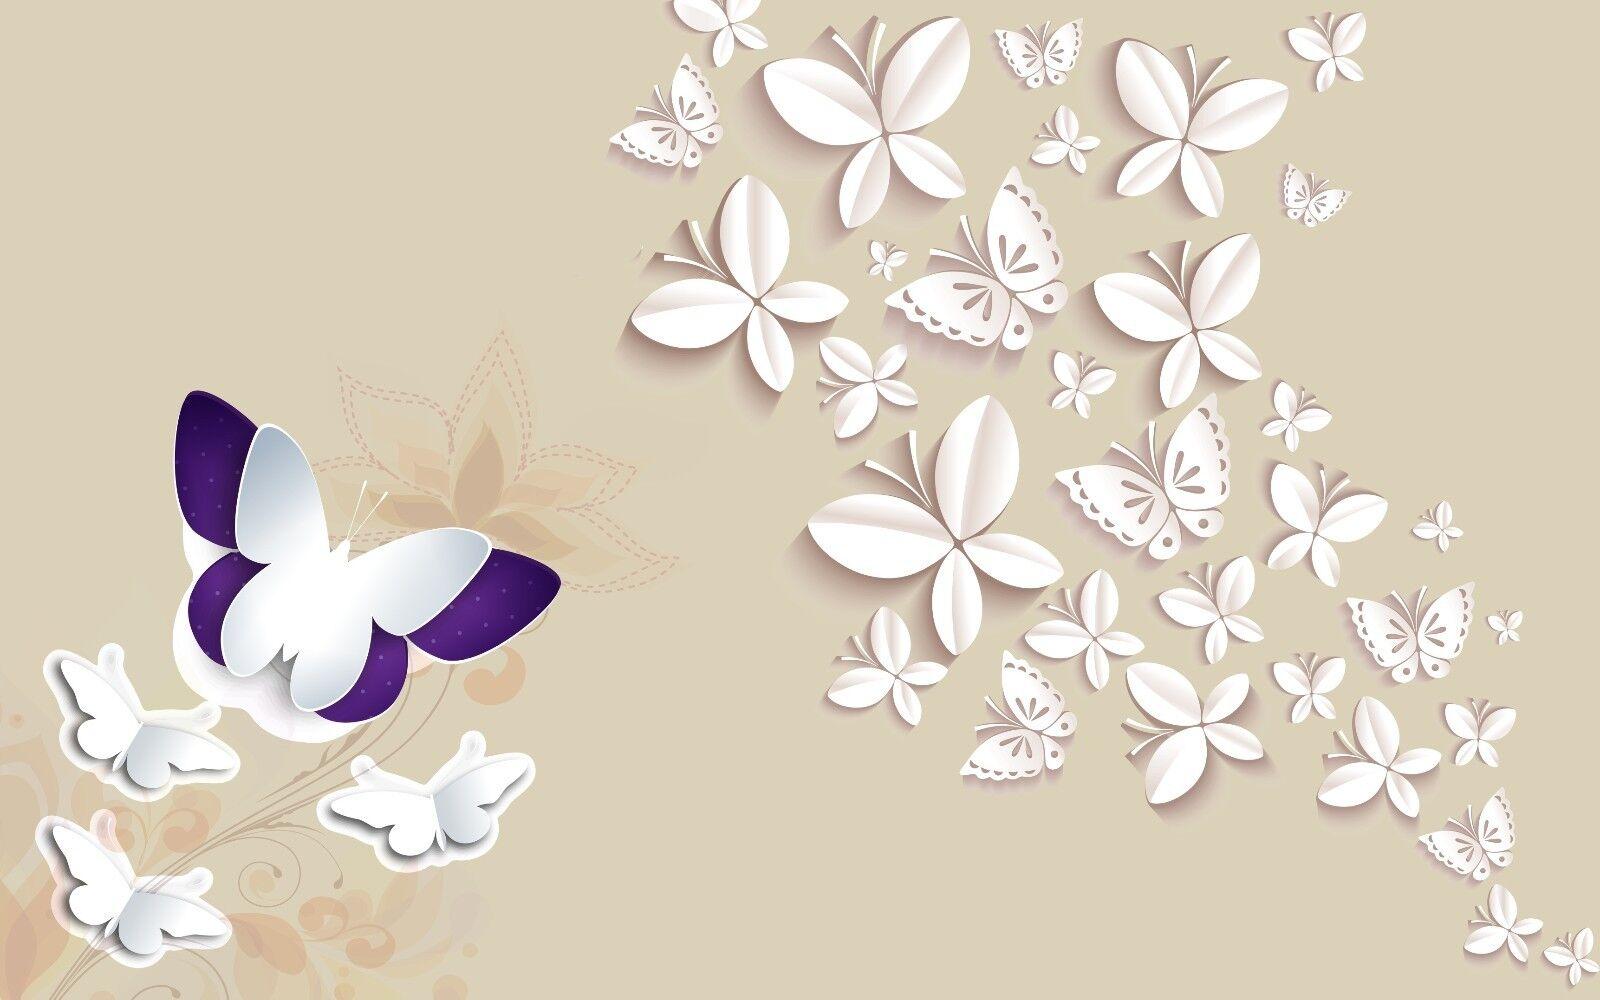 3D Schmetterling Schmetterling Schmetterling Muster 7854 Tapete Wandgemälde Tapeten Bild Familie DE Jenny | Shopping Online  | Niedriger Preis und gute Qualität  |  7f2159